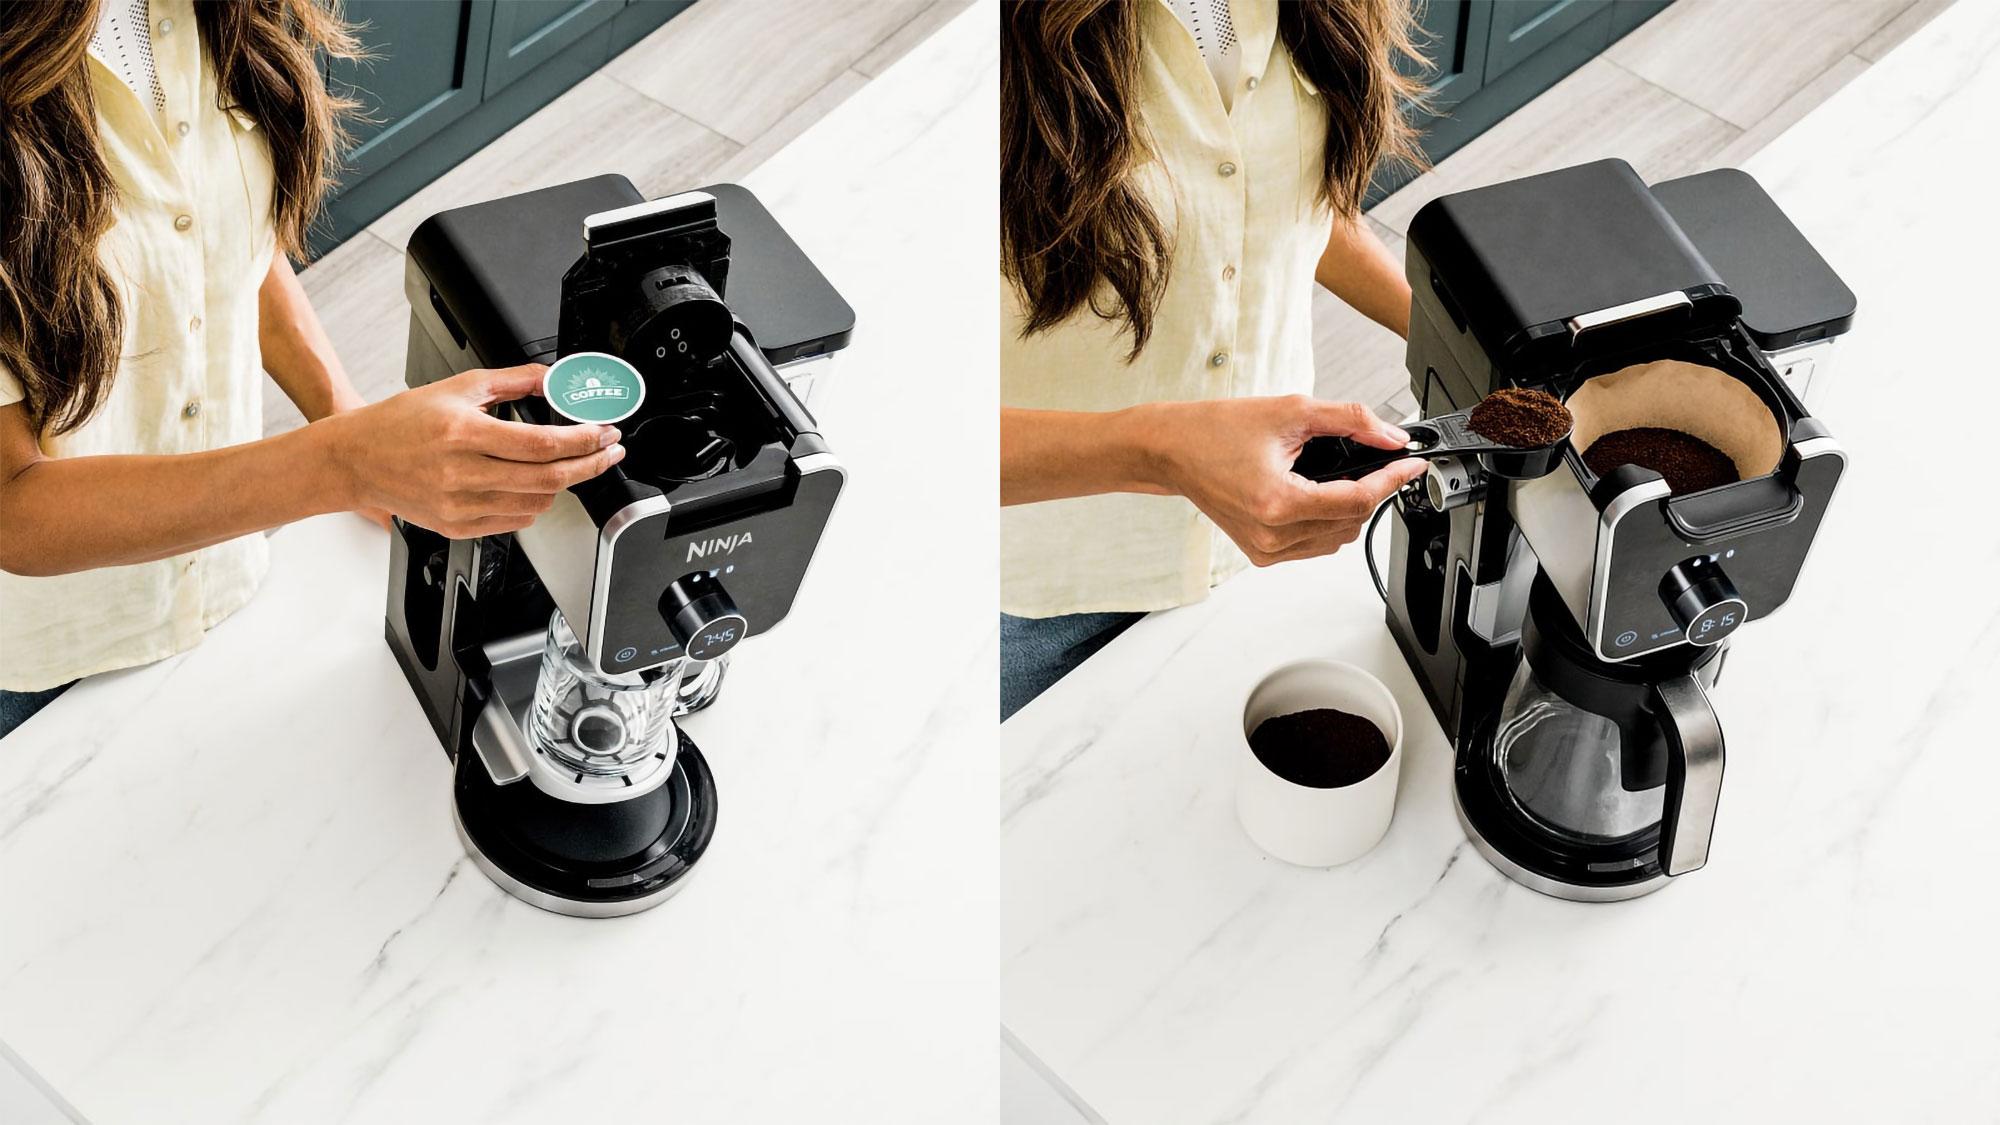 Ninja DualBrew Pro Specialty Coffee System